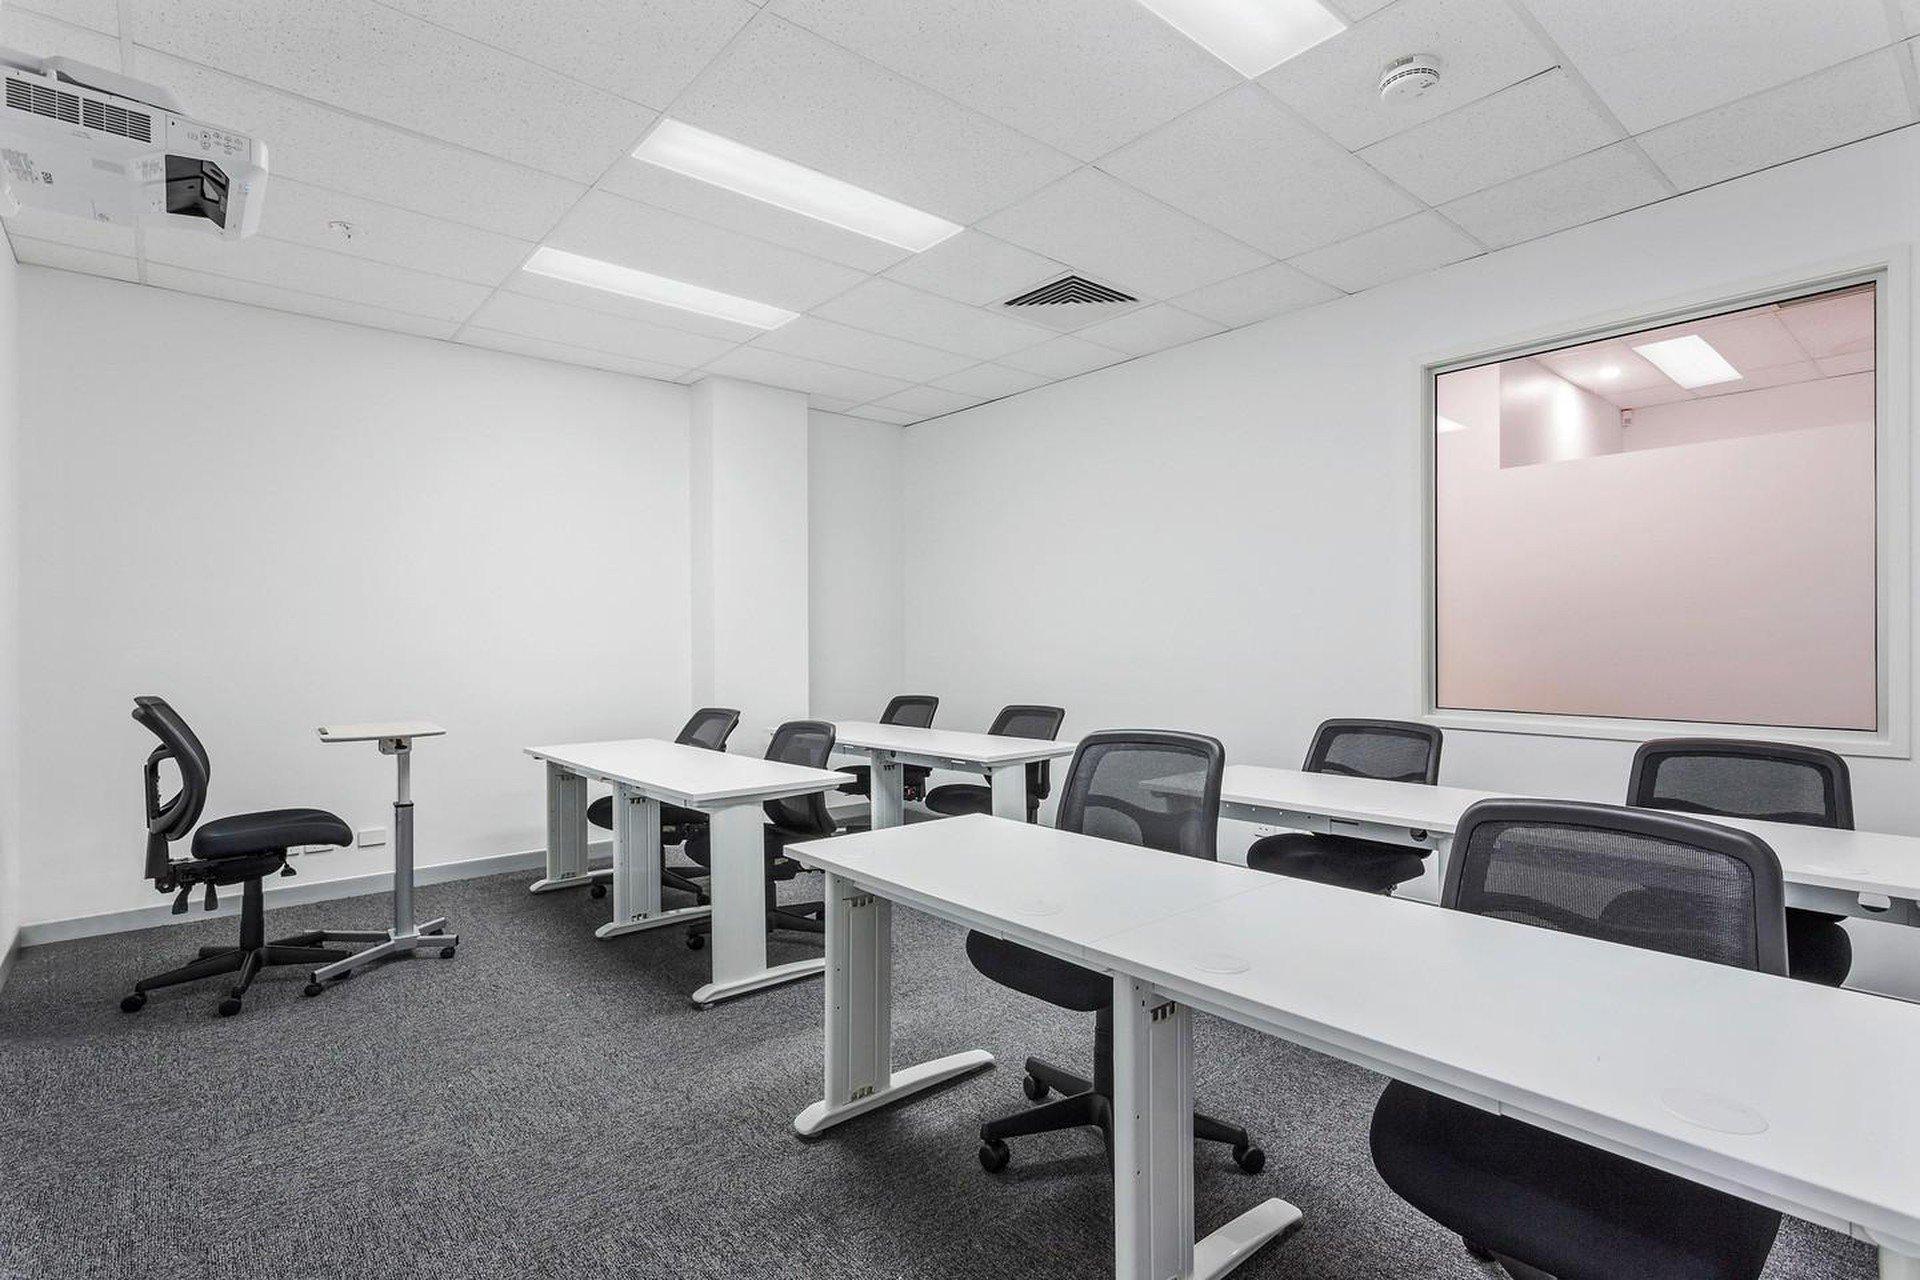 Brisbane conference rooms Salle de réunion Studio42 Mowbray Training Room image 1